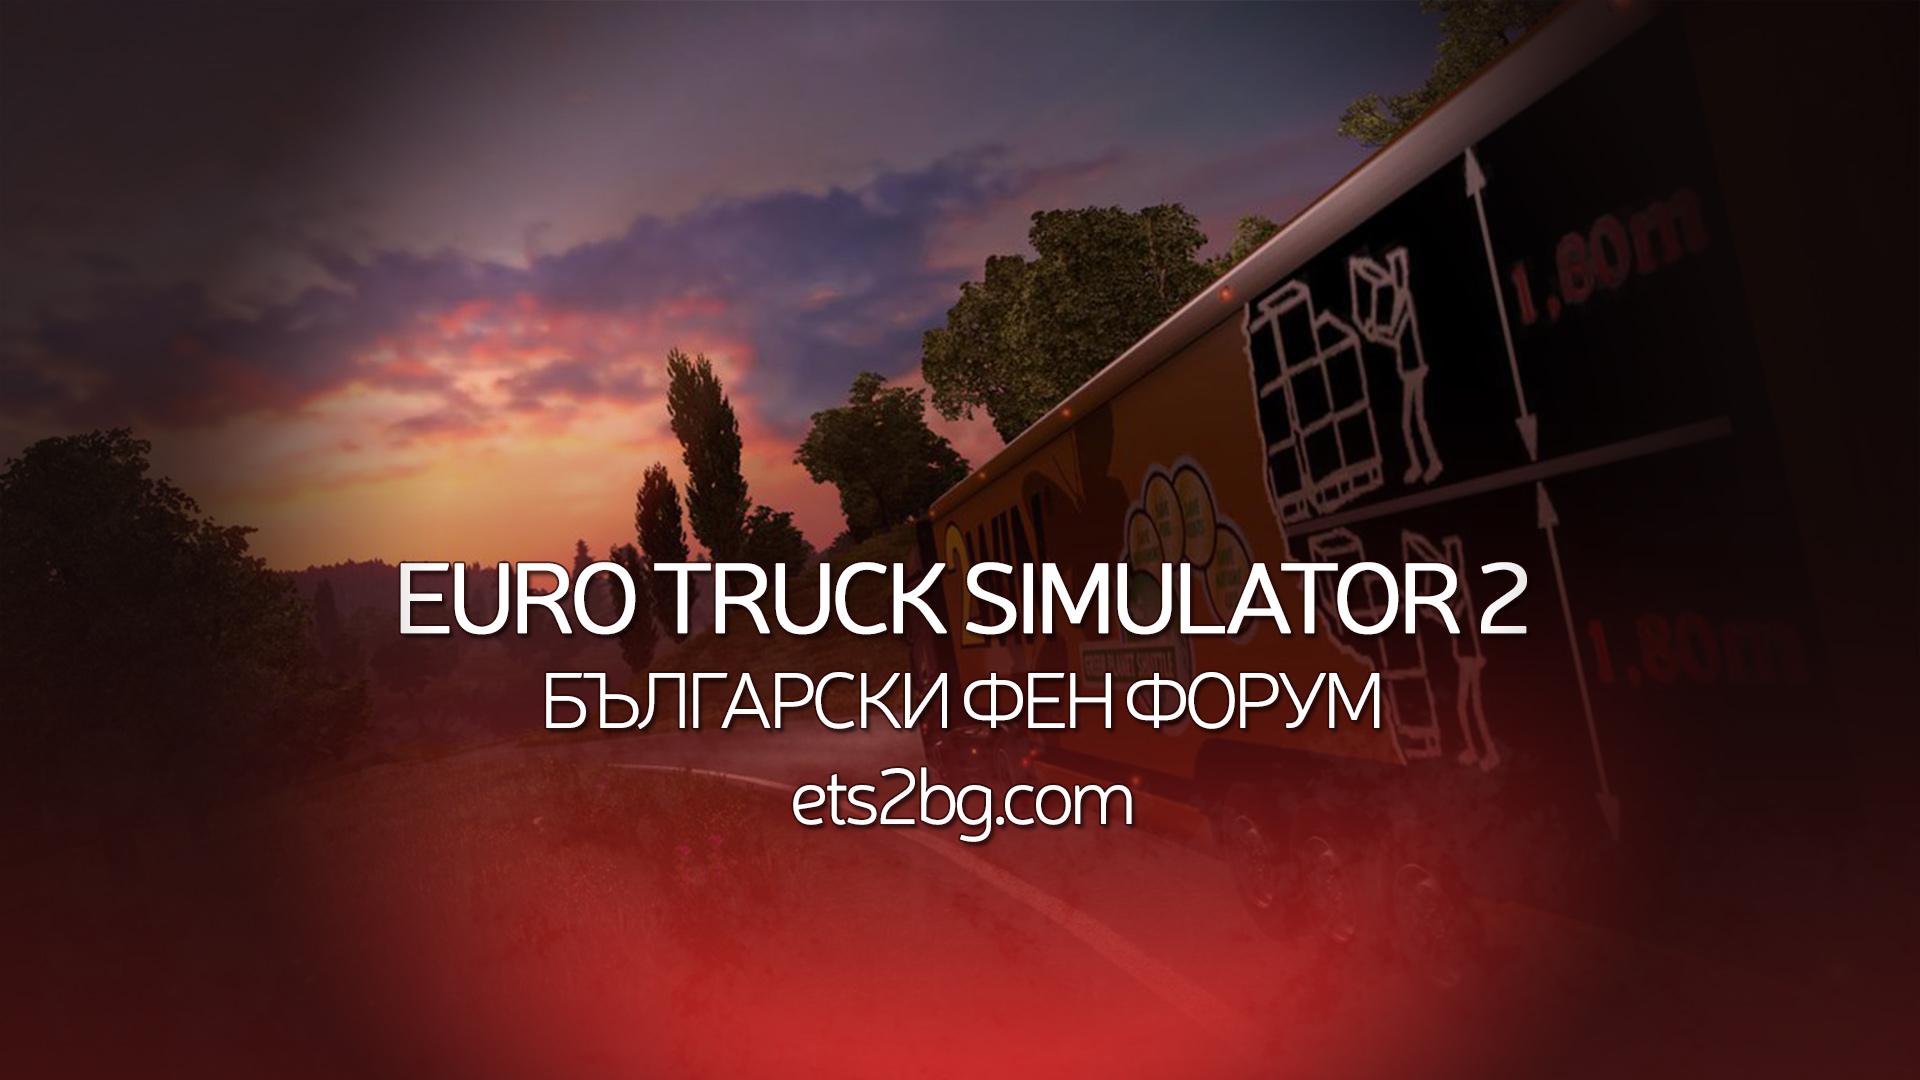 ETS2BG – Български фен форум